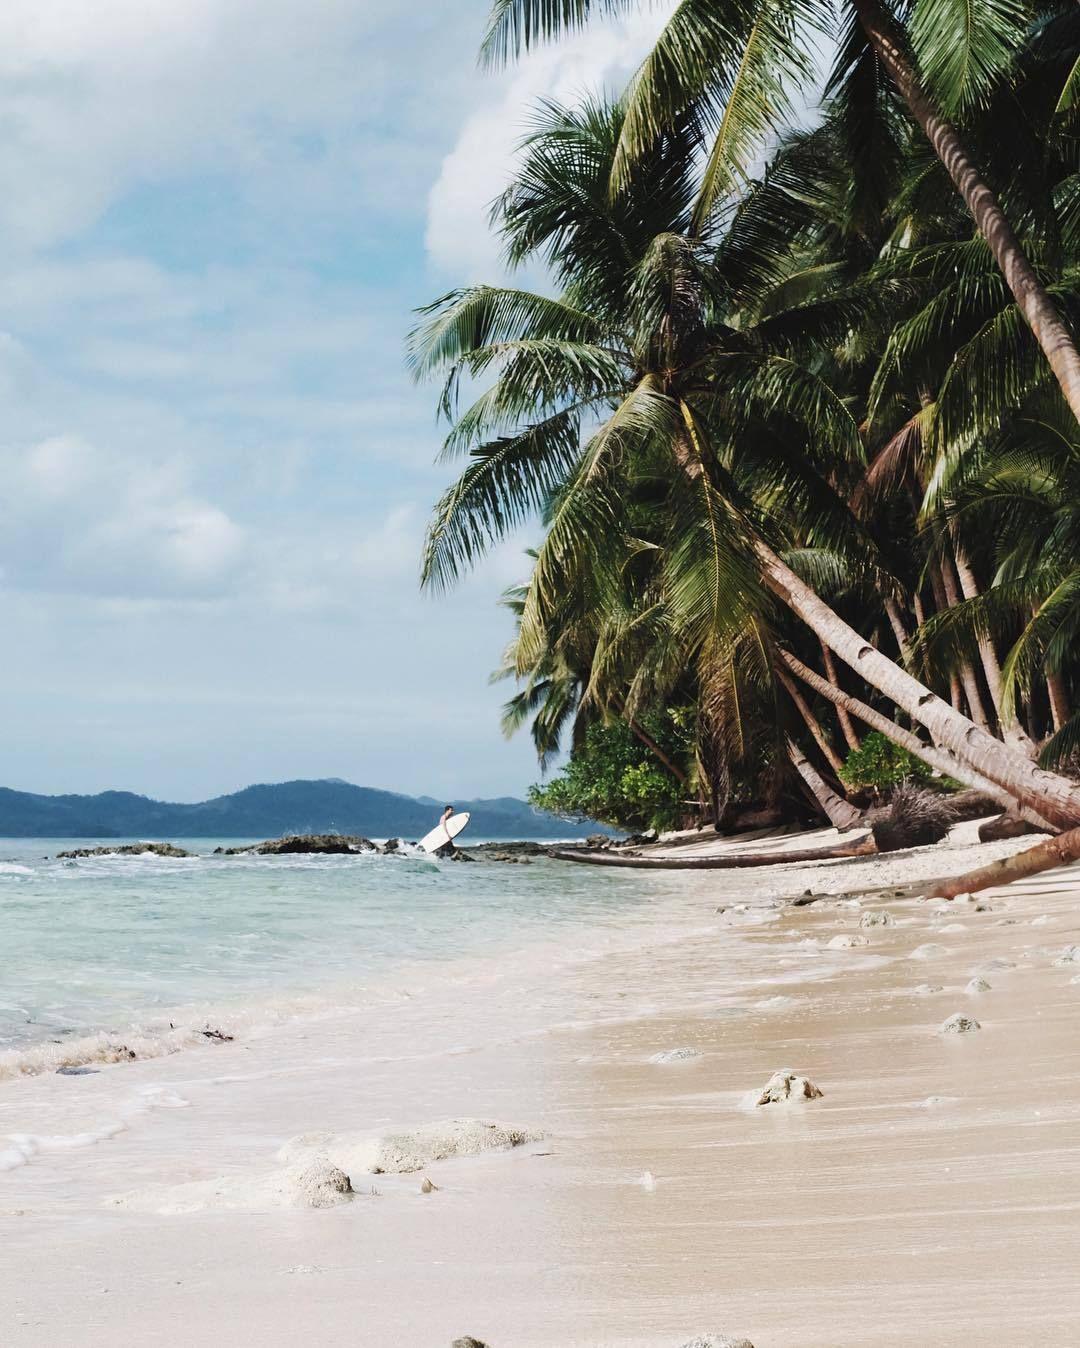 Rook Islands | Far Cry Wiki | FANDOM powered by Wikia  |Rook Island Real Life